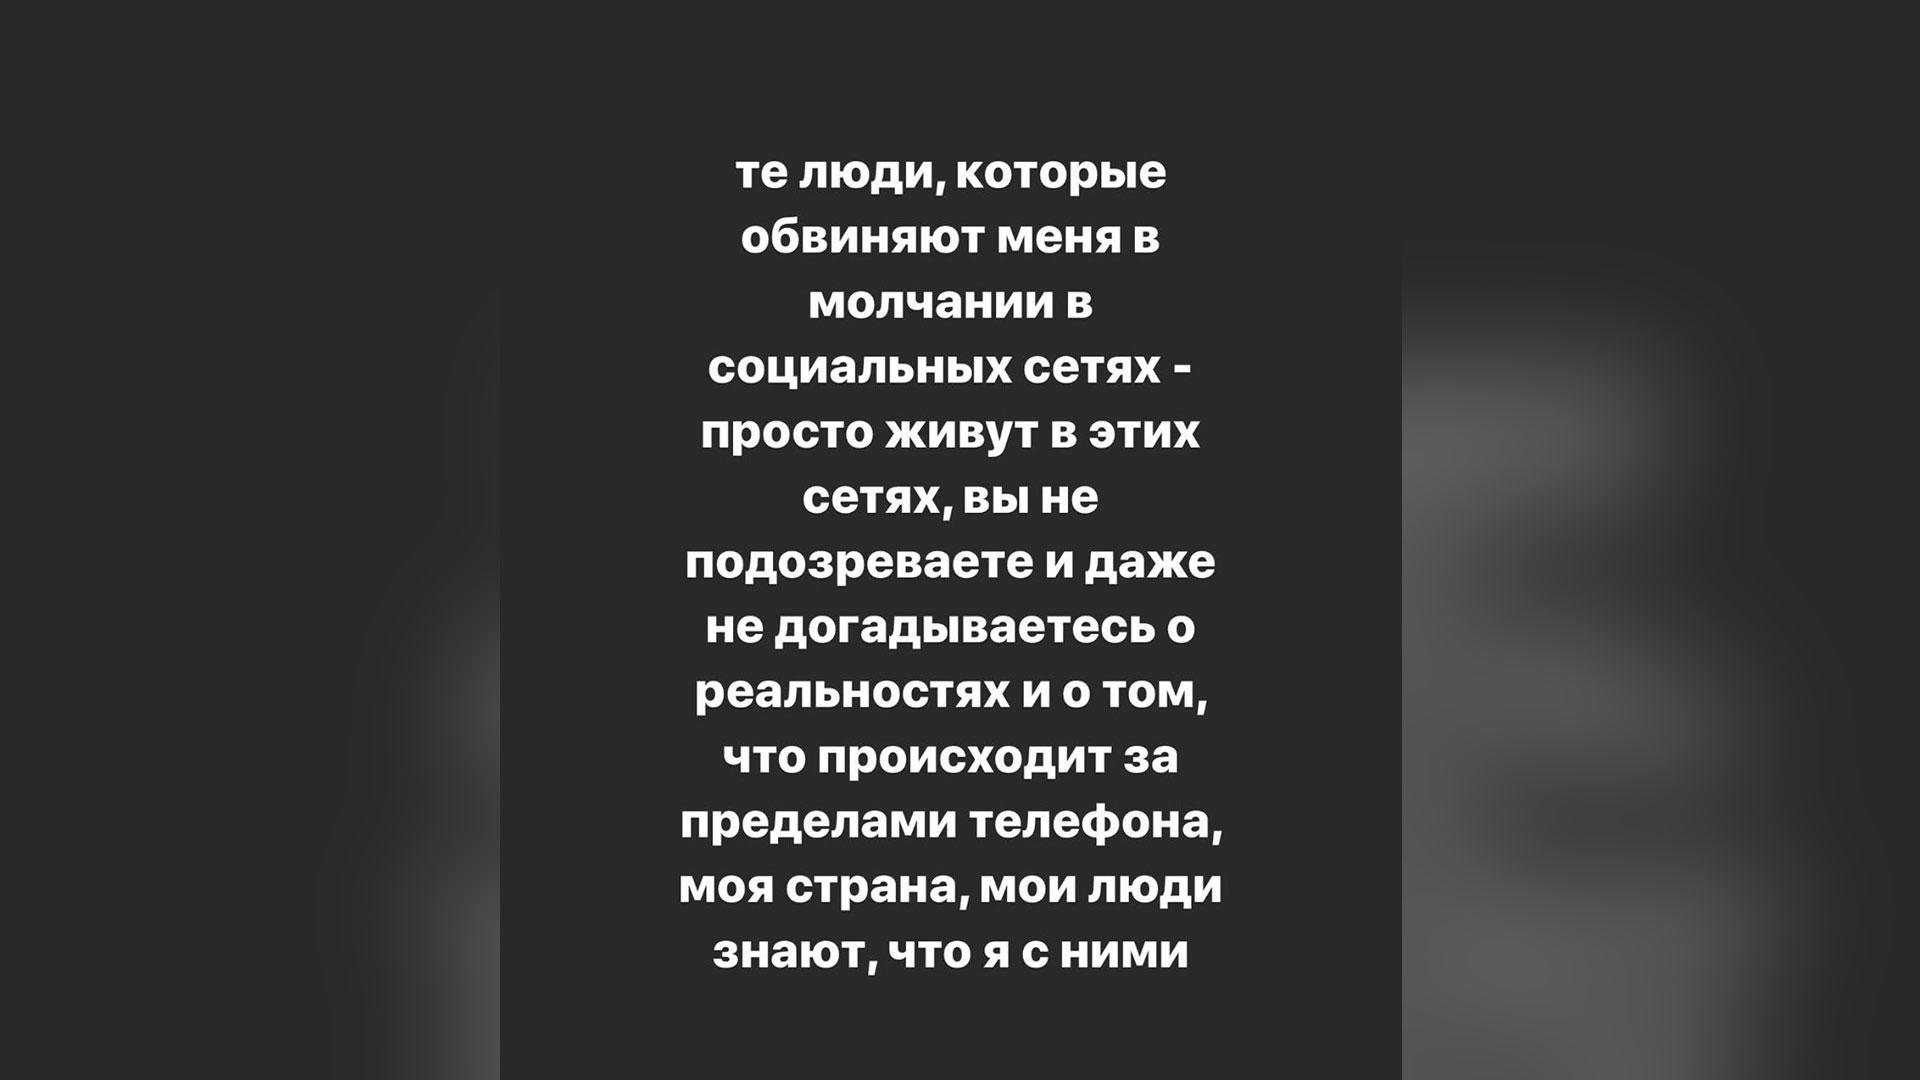 Фото © Instagram / timabelorusskih